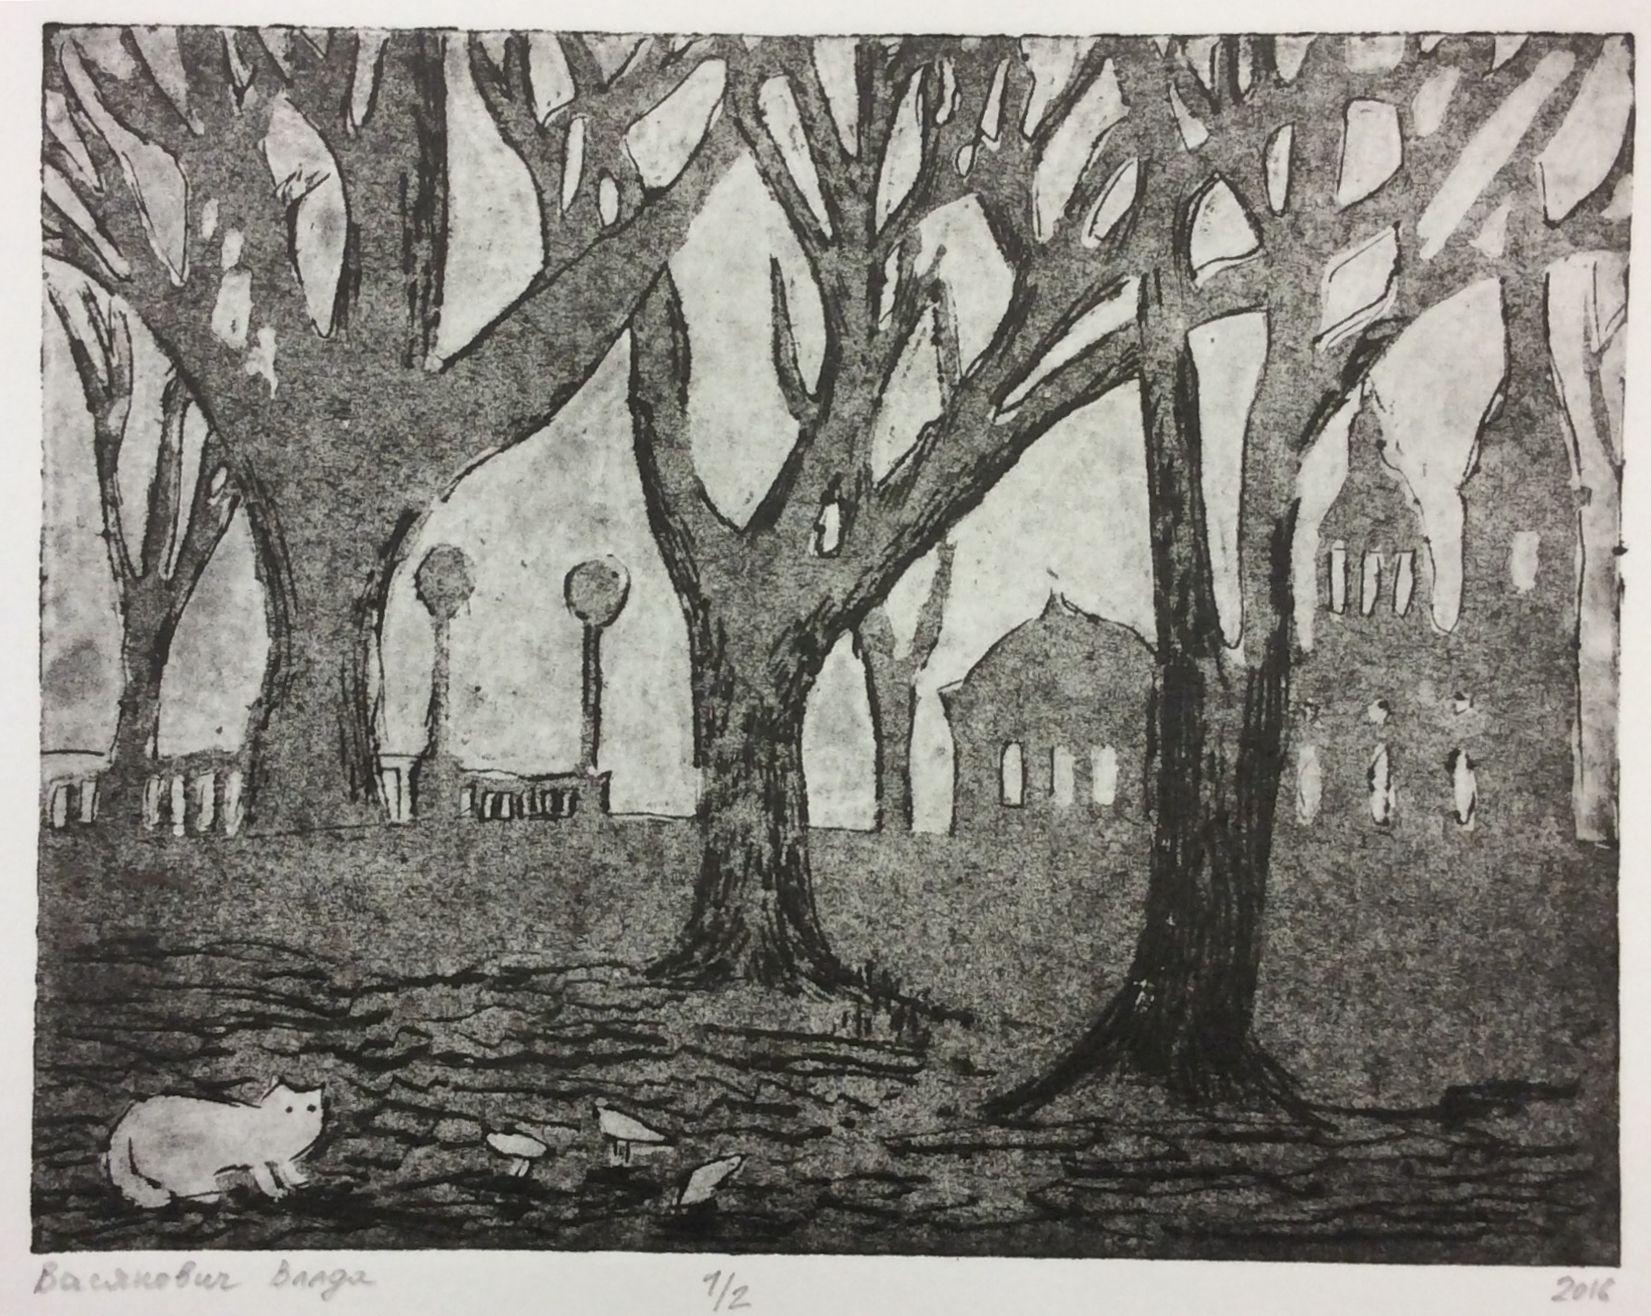 «Осень вгороде», Васянович Влада (13 лет), гравюра на картоне, преп. Воронова В. В.